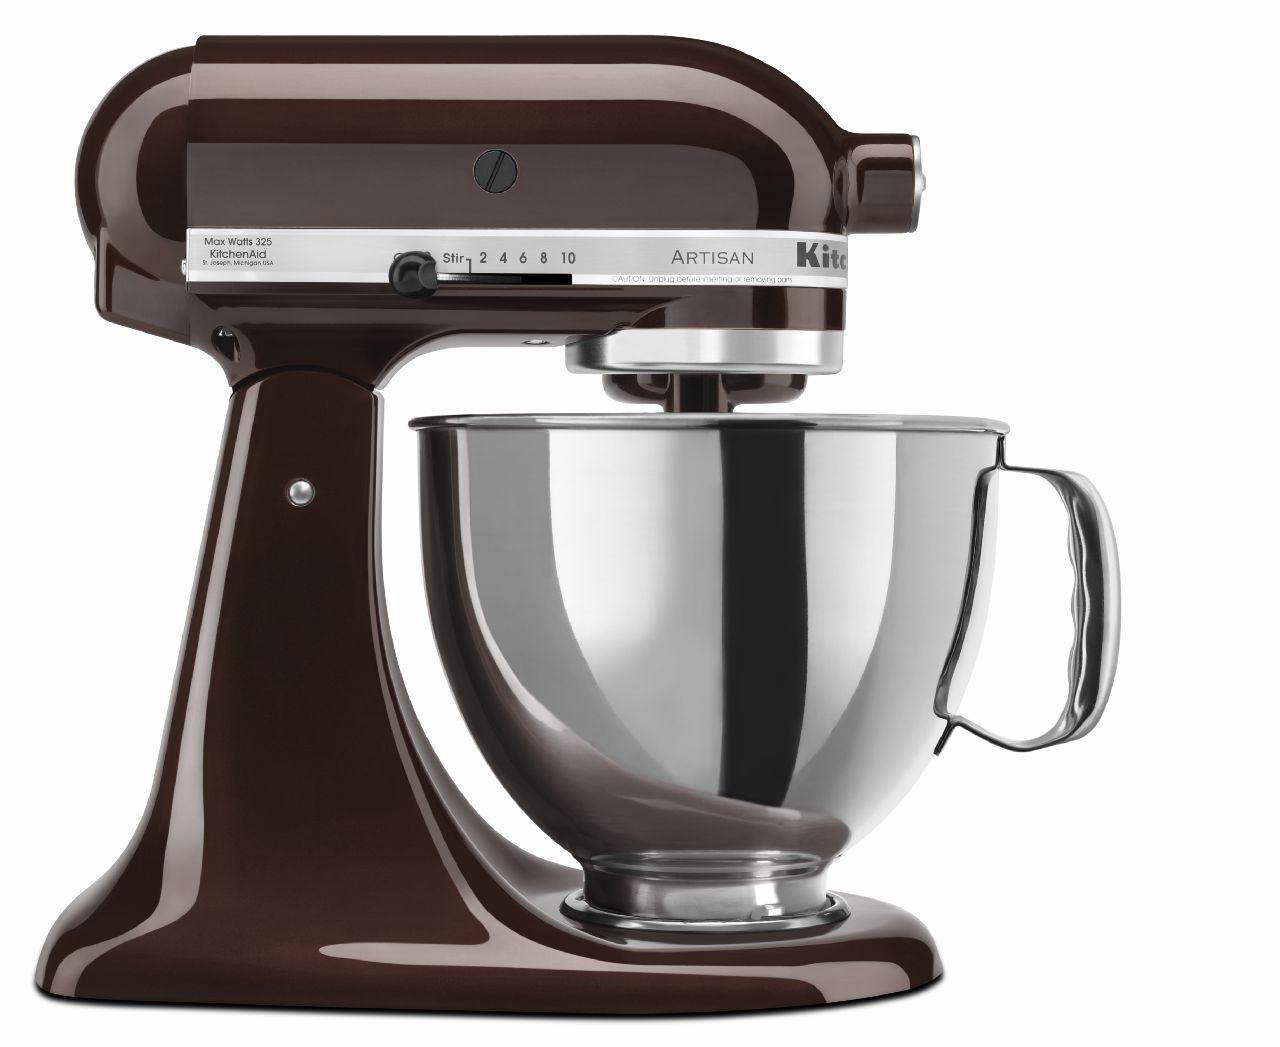 KitchenAid-Artisan-Series-5-Quart-Tilt-Head-Stand-Mixer-10-Speeds-KSM150PS thumbnail 55